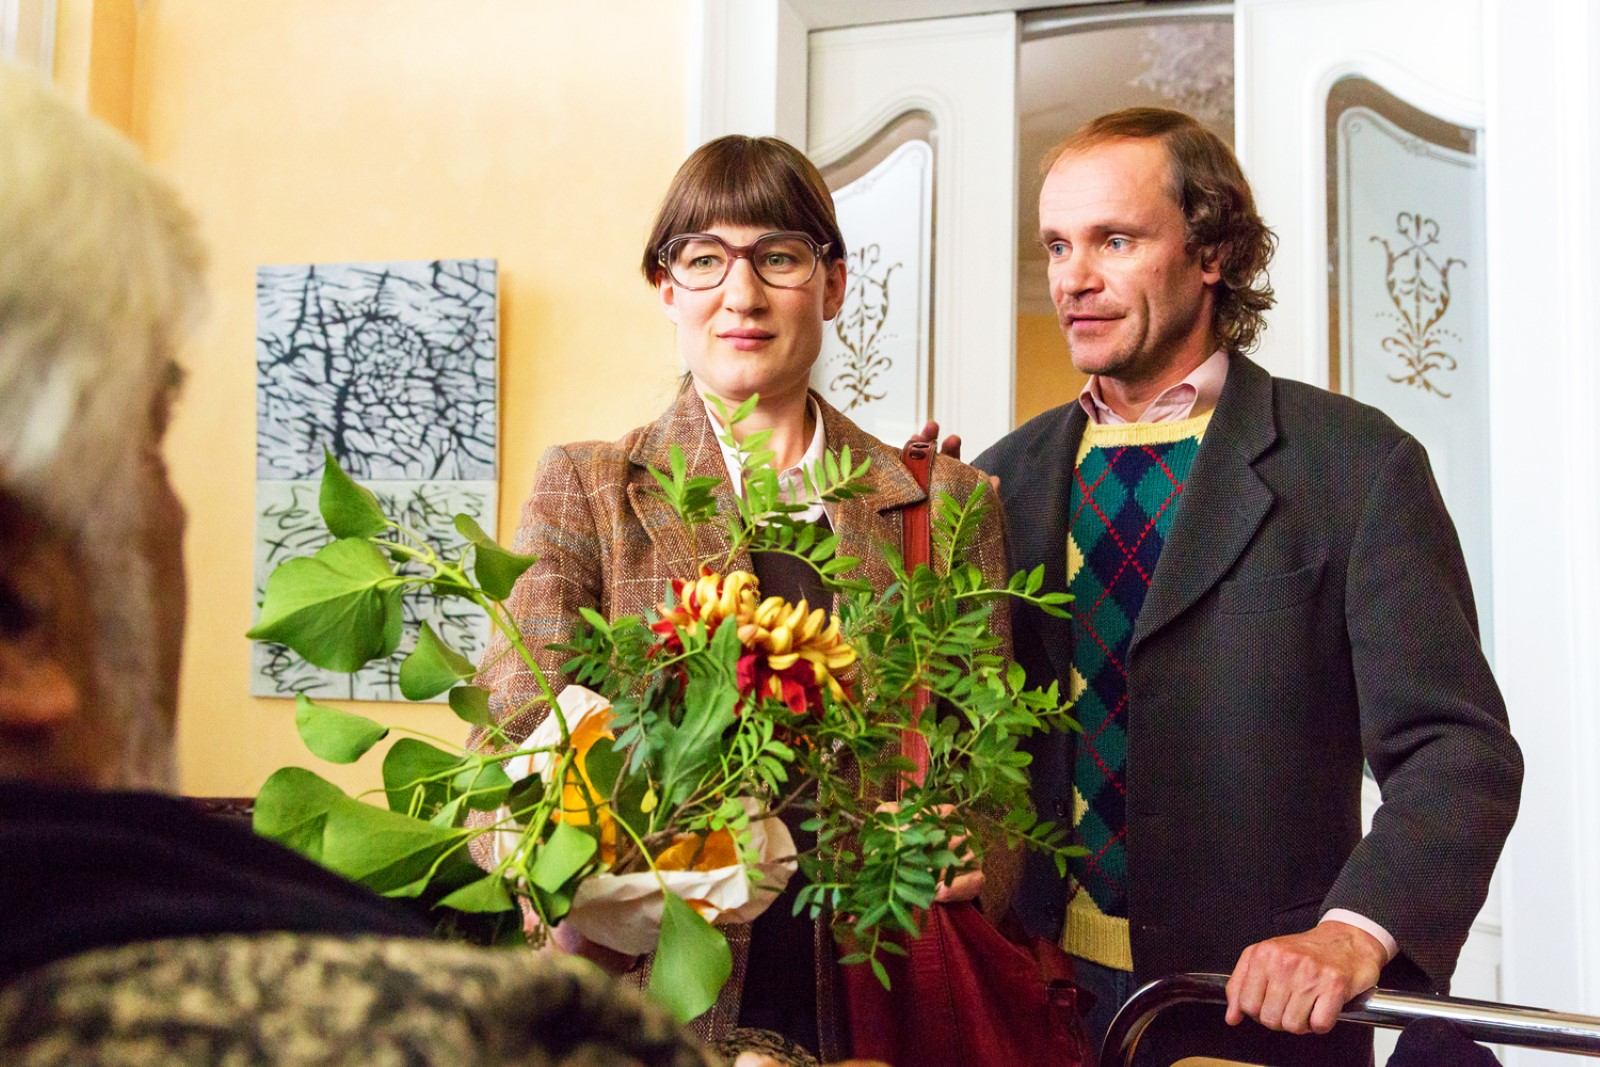 Schubert In Love 2016 FILMSTARTS